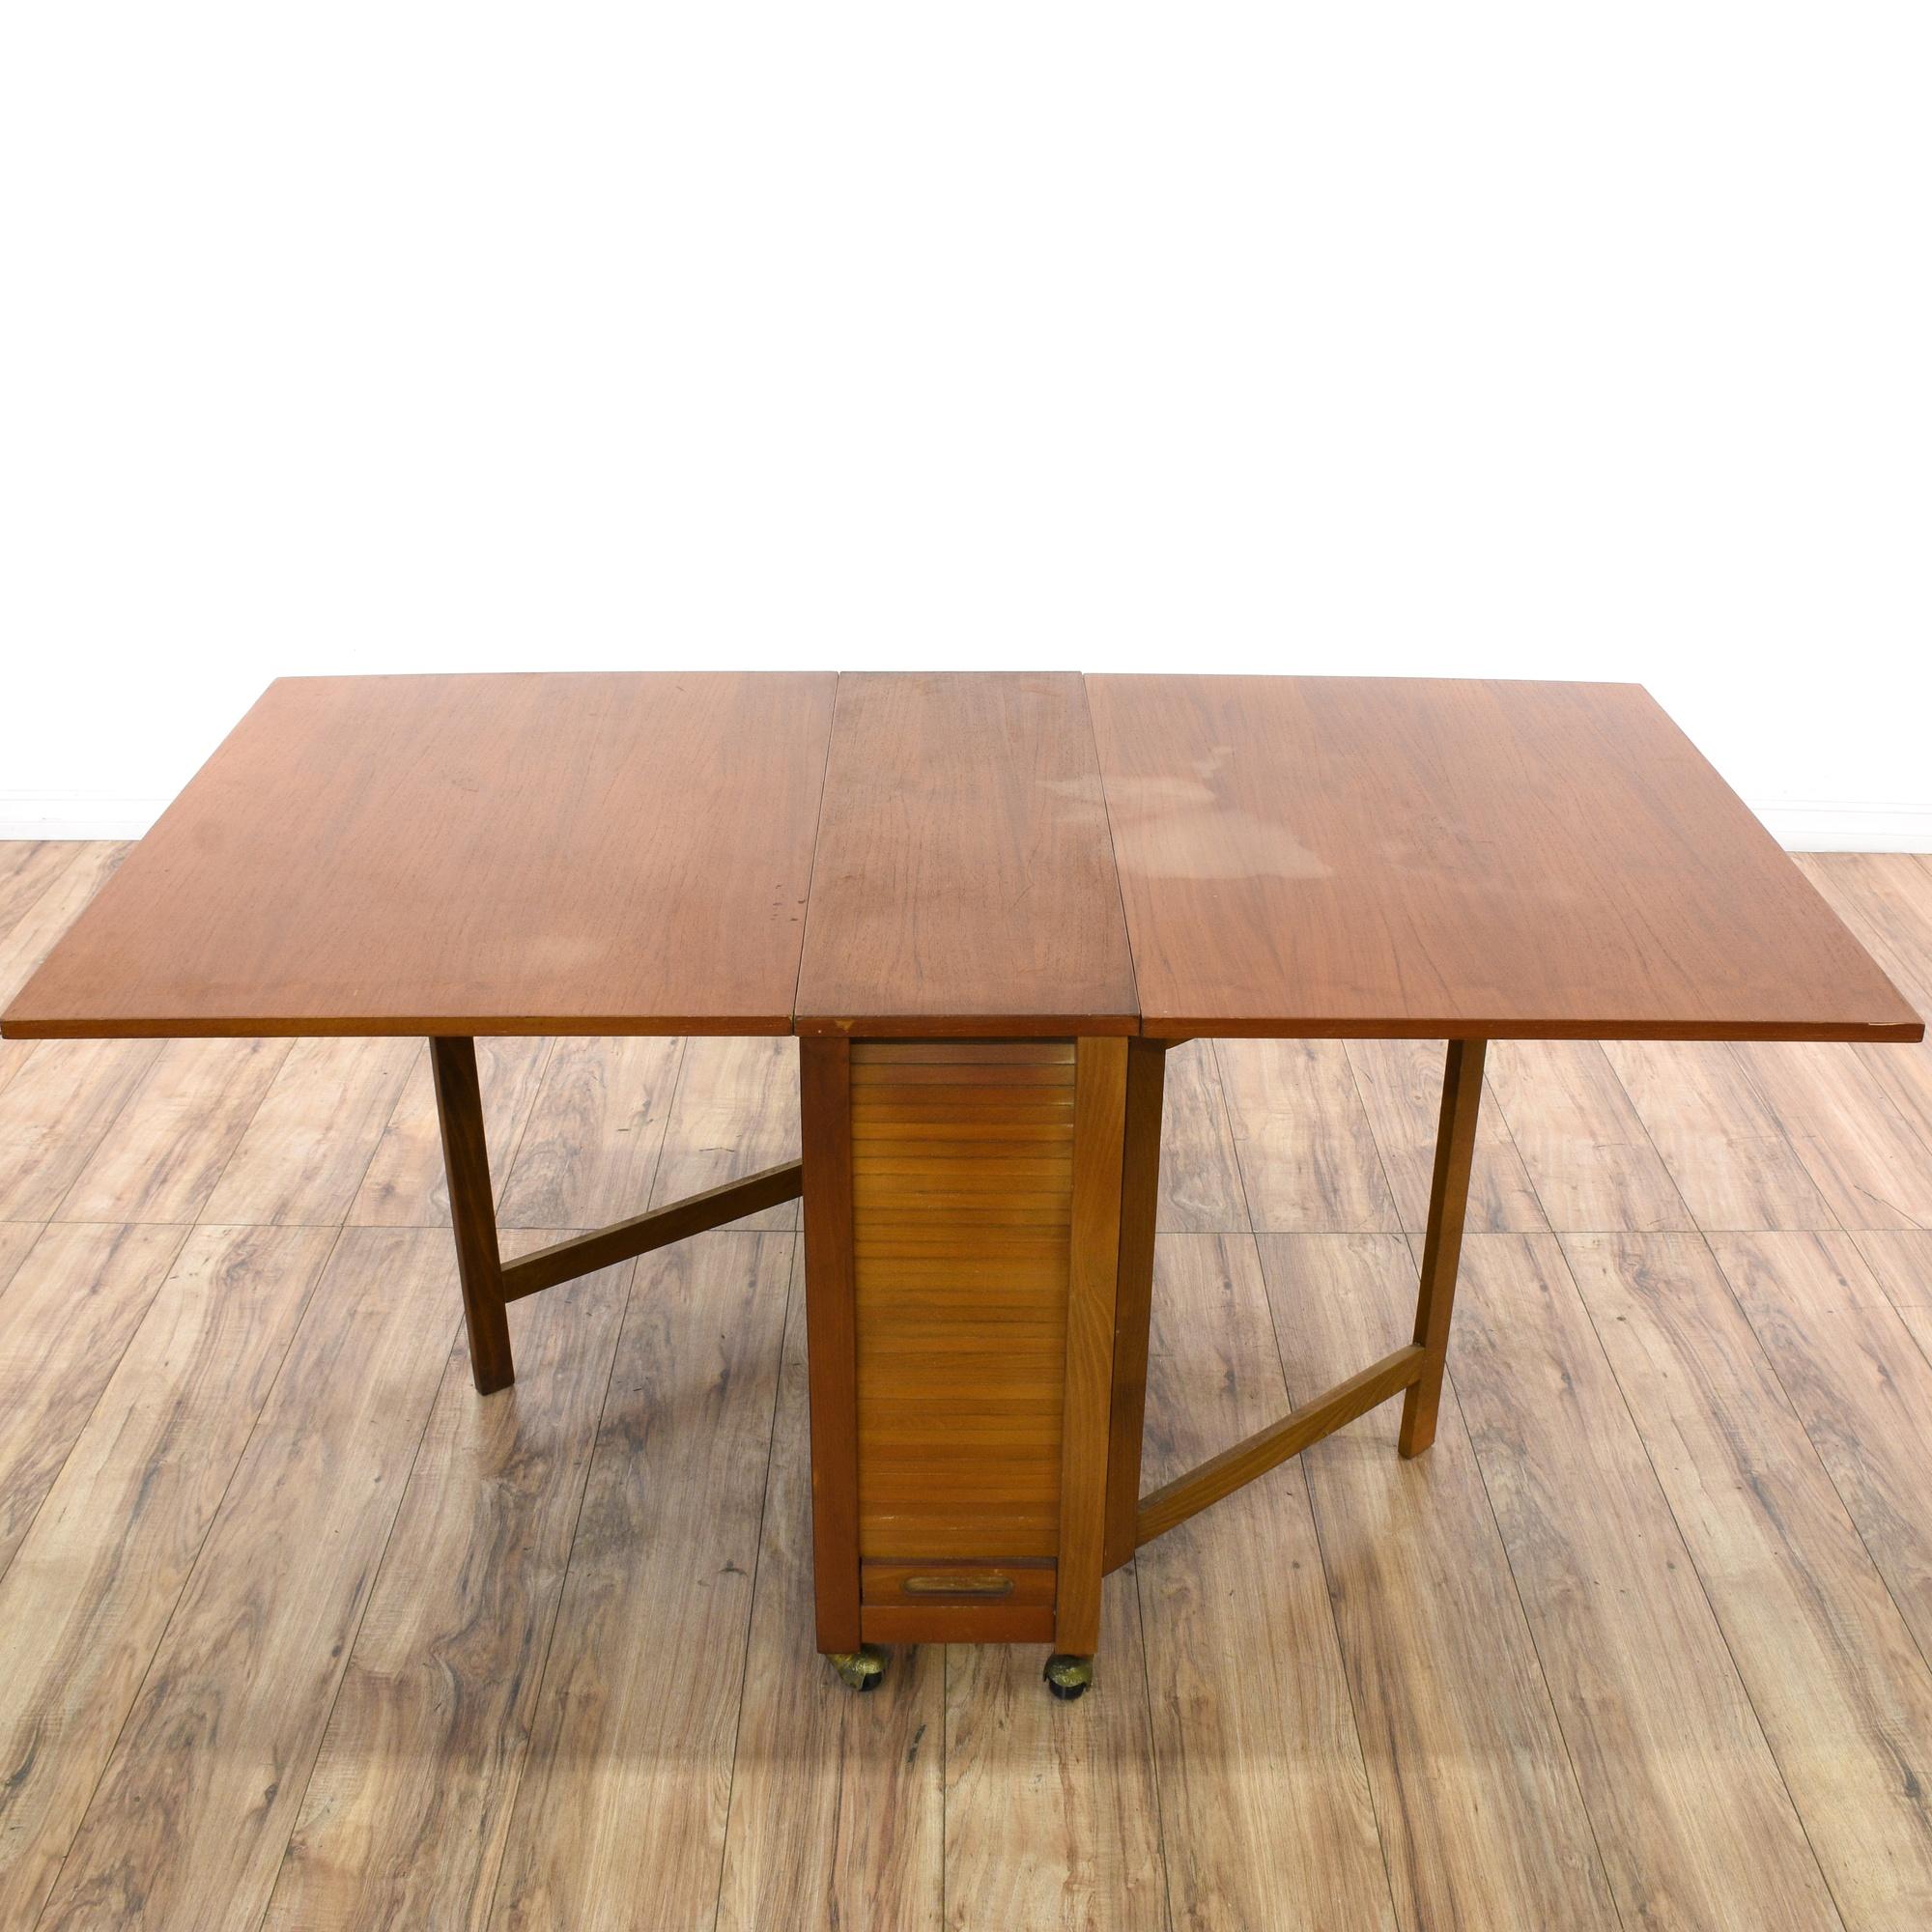 Drop Leaf Hideaway Dining Table 4 Folding Chairs Loveseat Vintage Fur